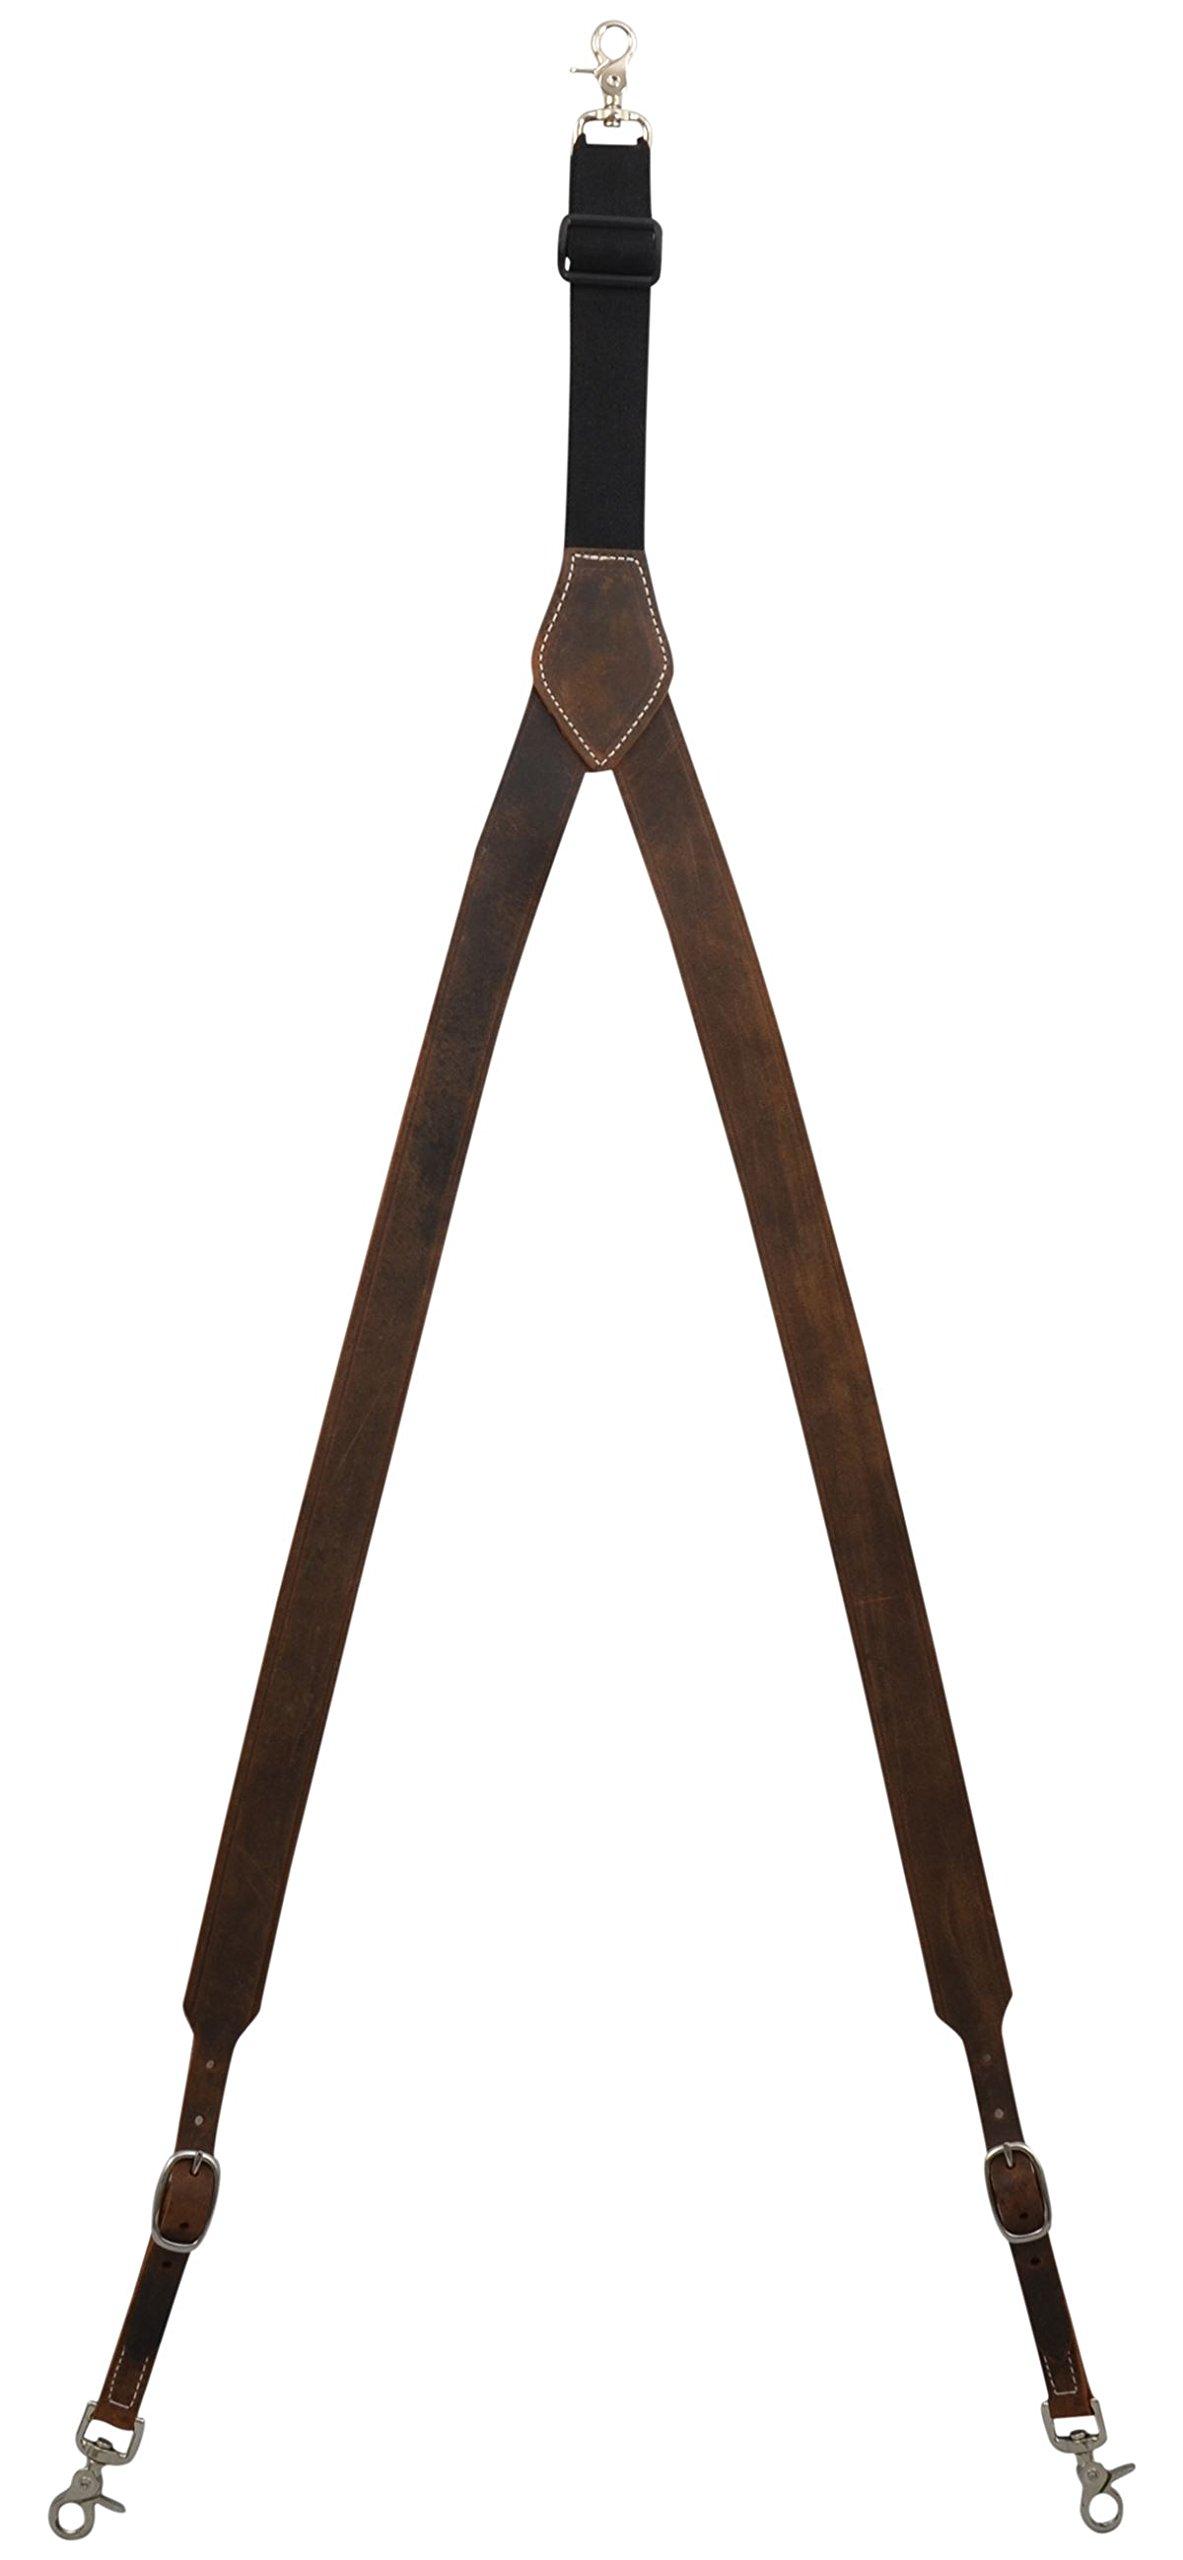 3D Brown Leather Suspenders